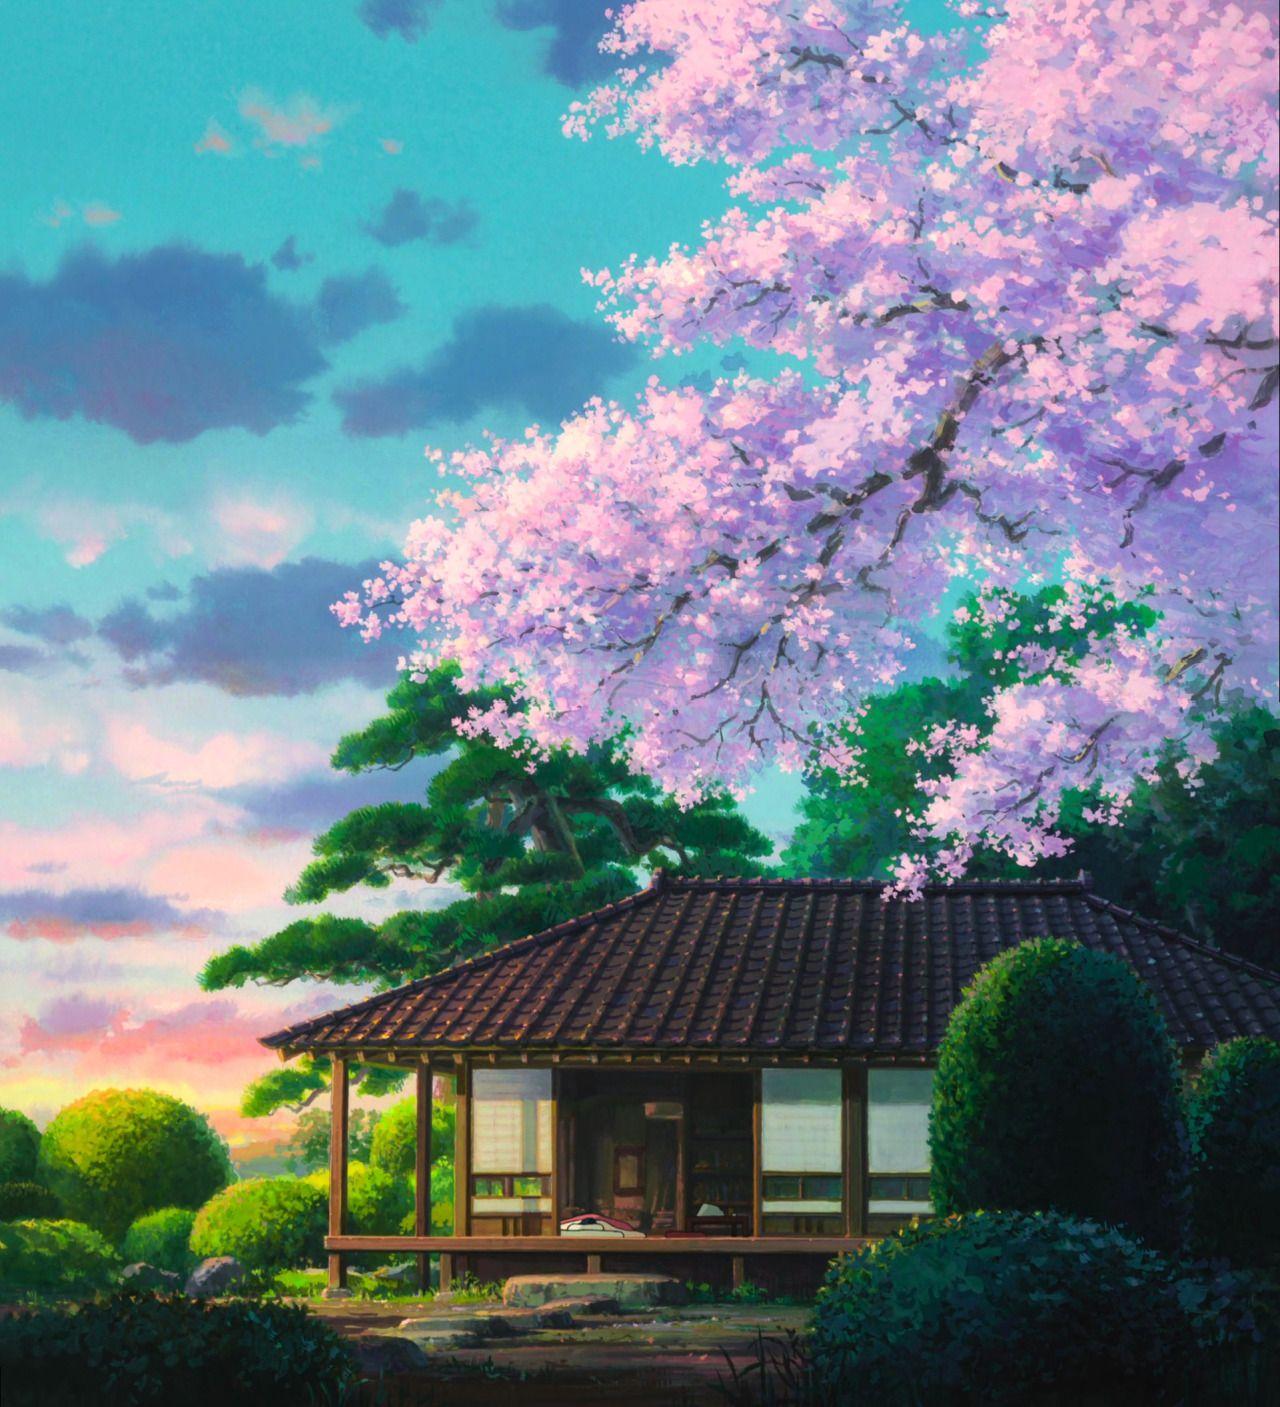 Studio Ghibli Studio ghibli background, Studio ghibli